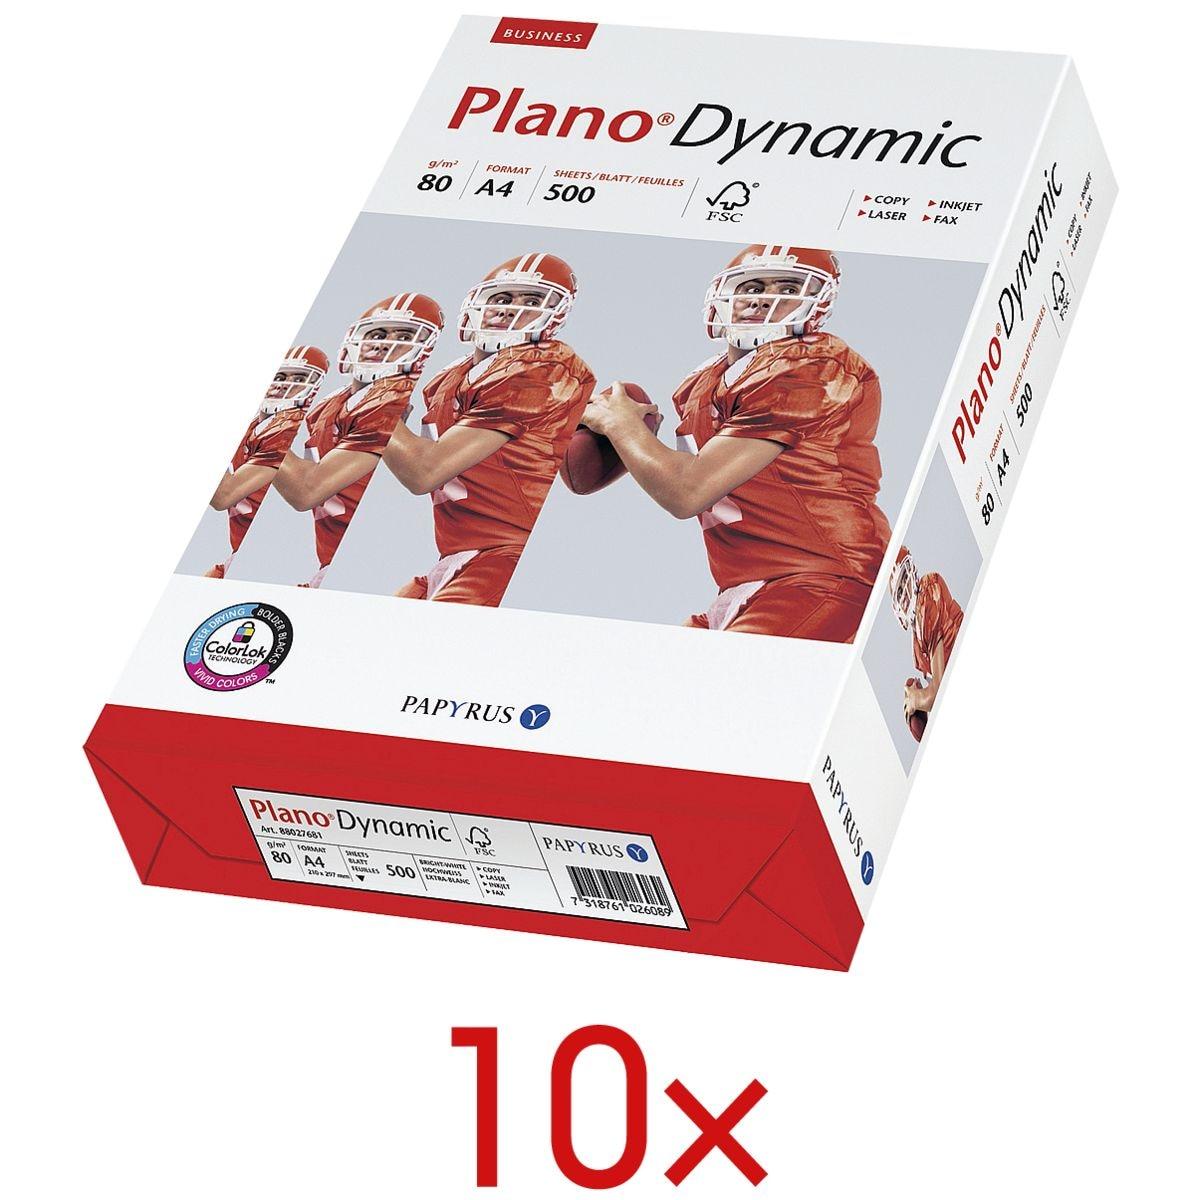 10x Multifunktionales Druckerpapier A4 Plano Dynamic - 5000 Blatt gesamt